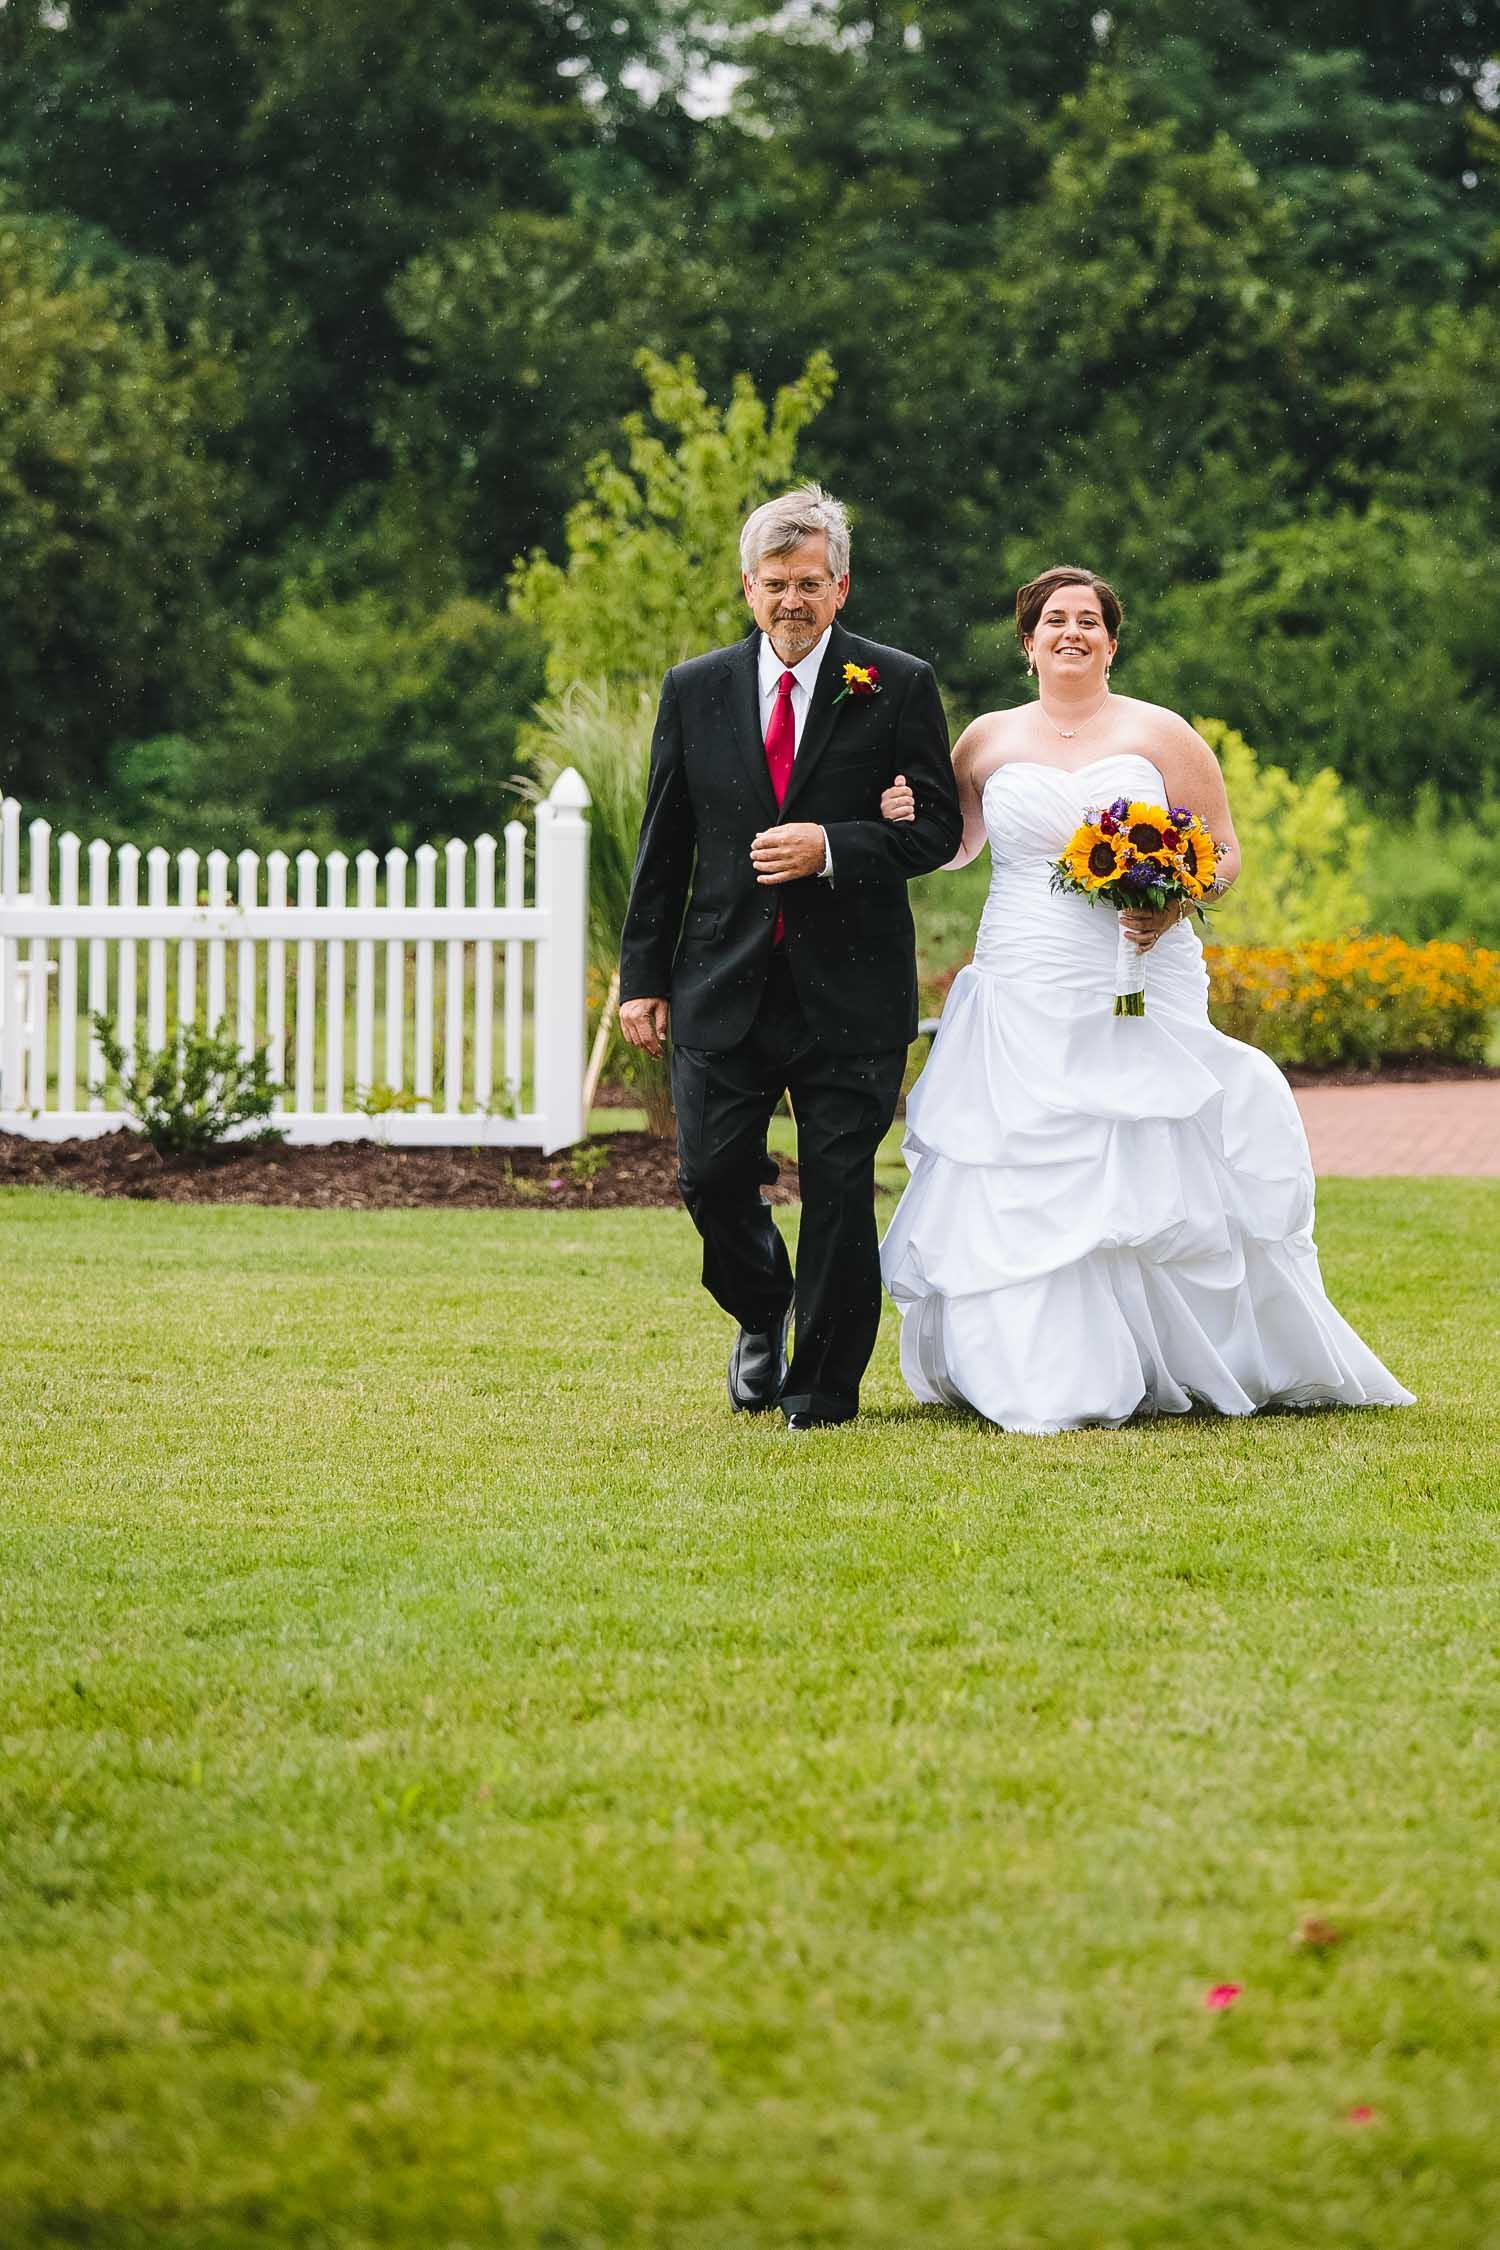 caputi-wedding-44.jpg